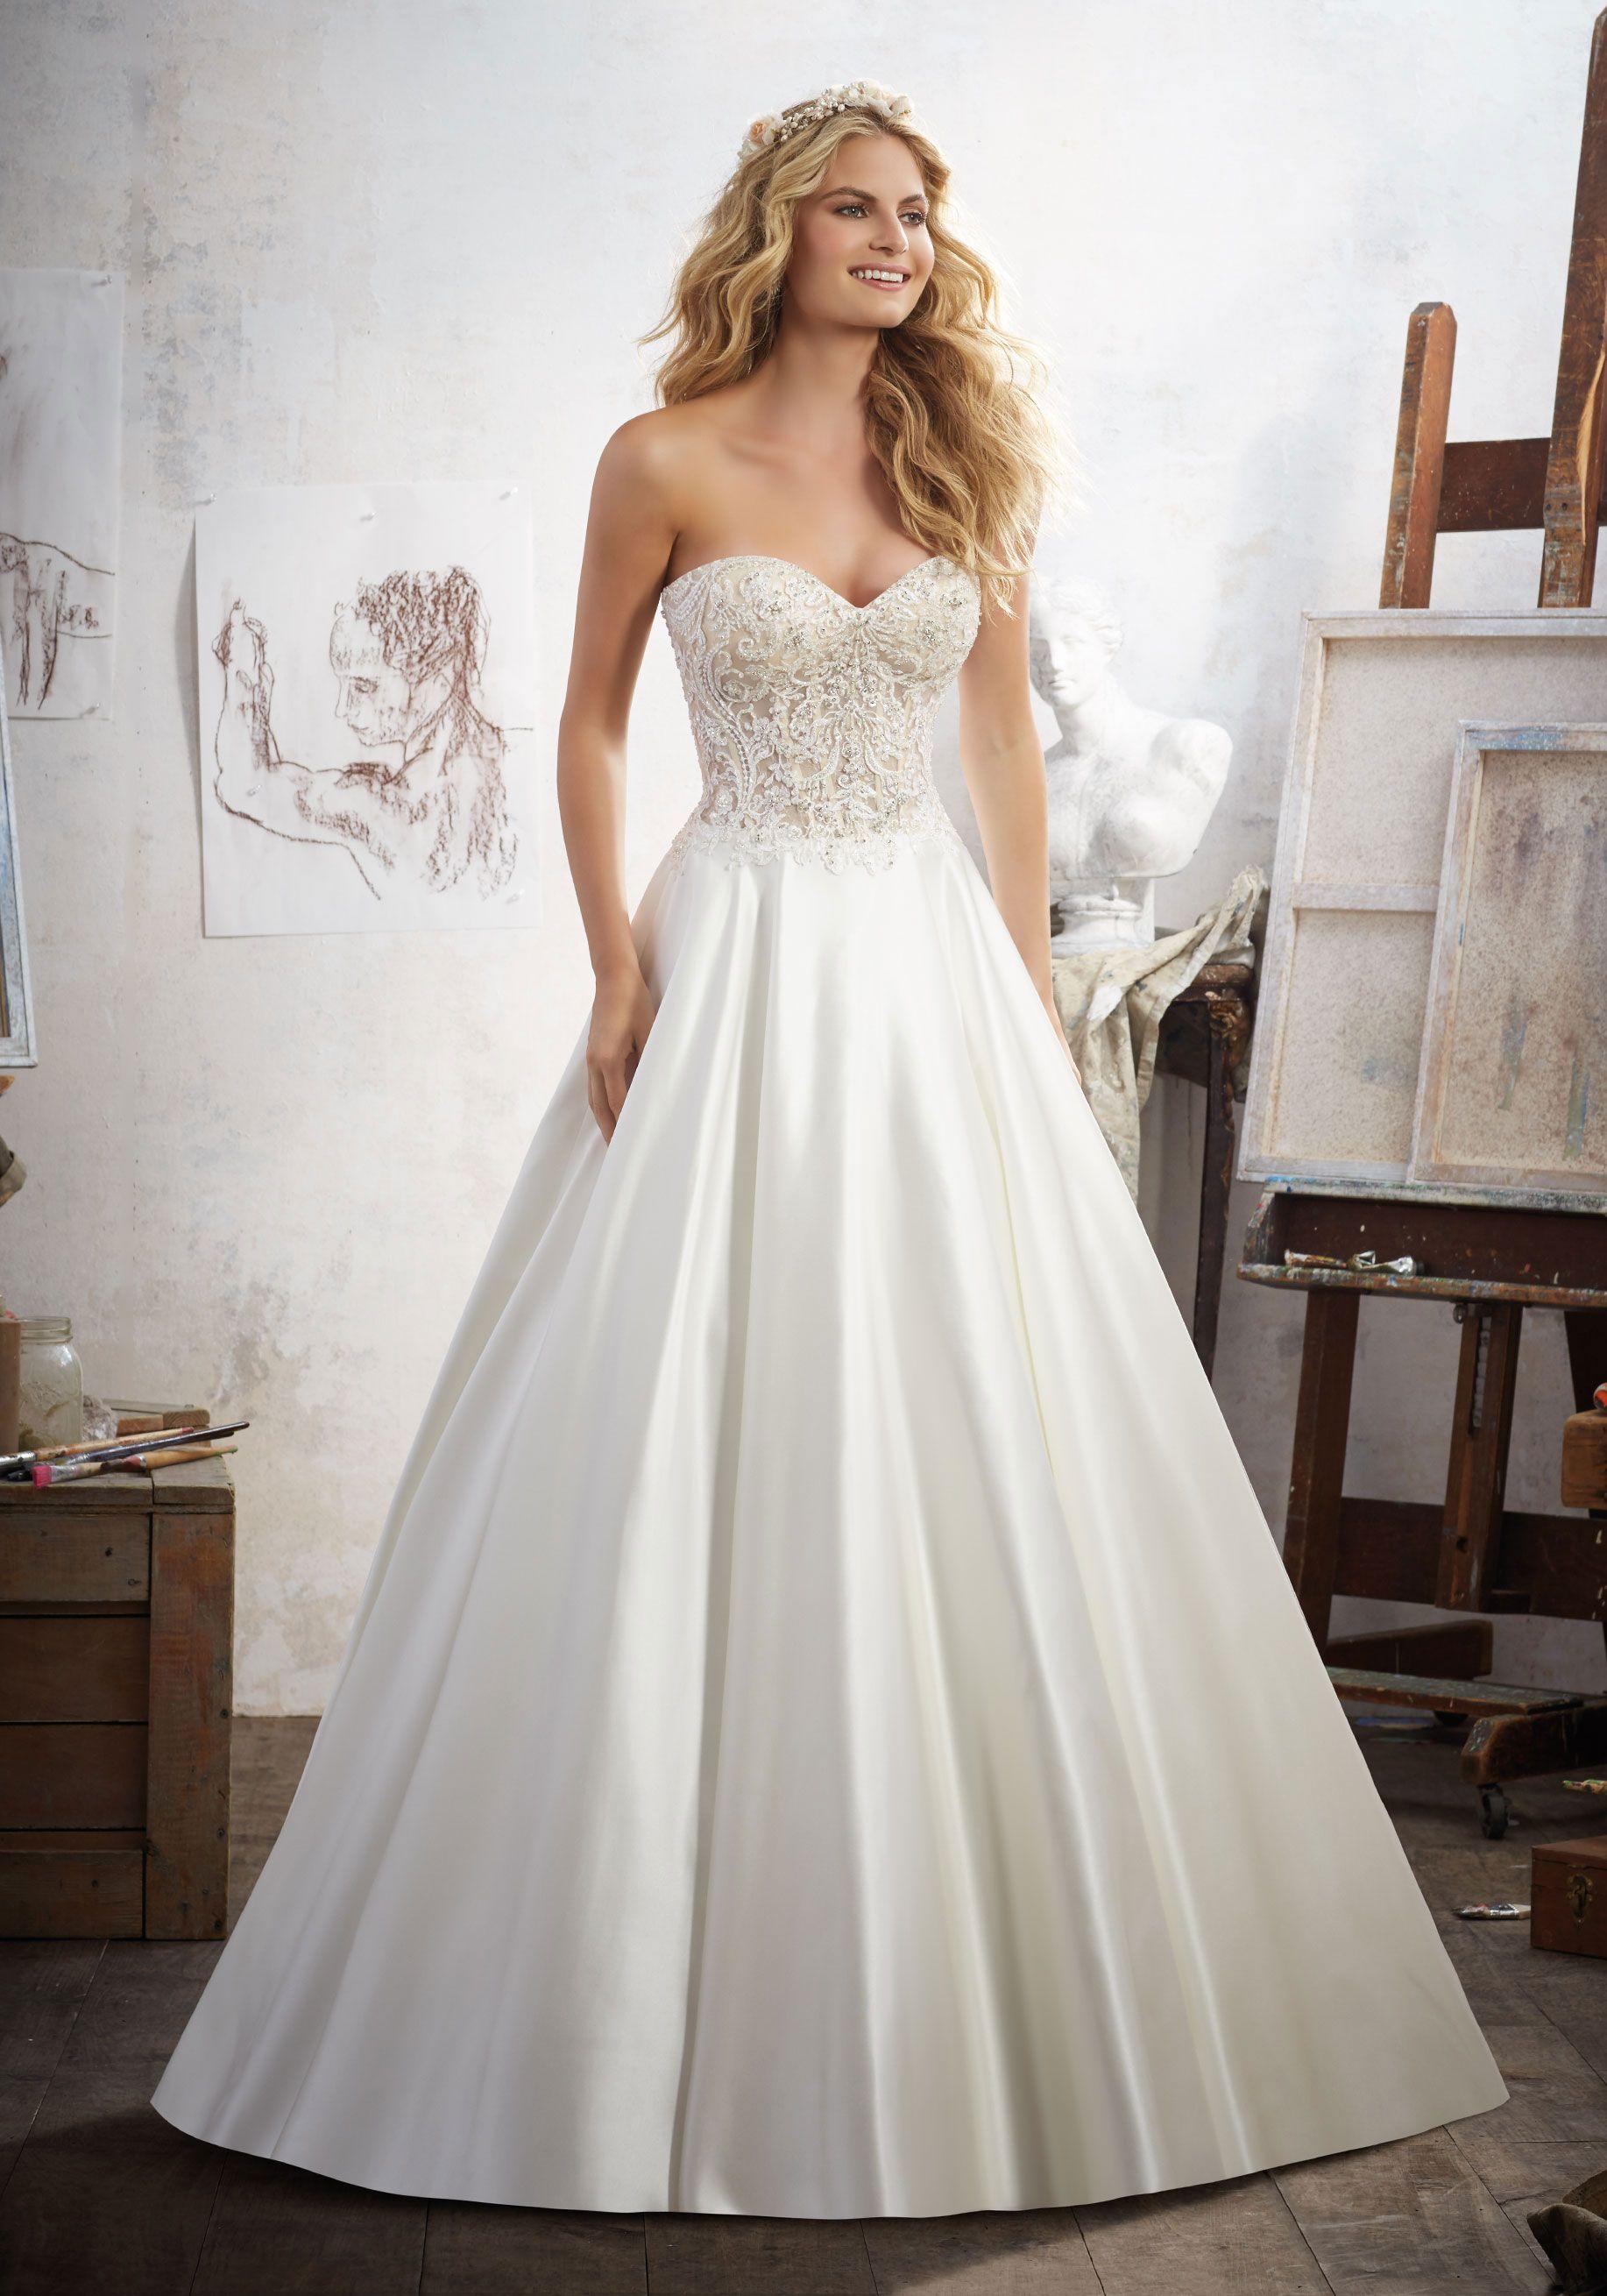 MORI LEE- Mara Wedding Dress Style: 8114   Mori Lee Bridal ...